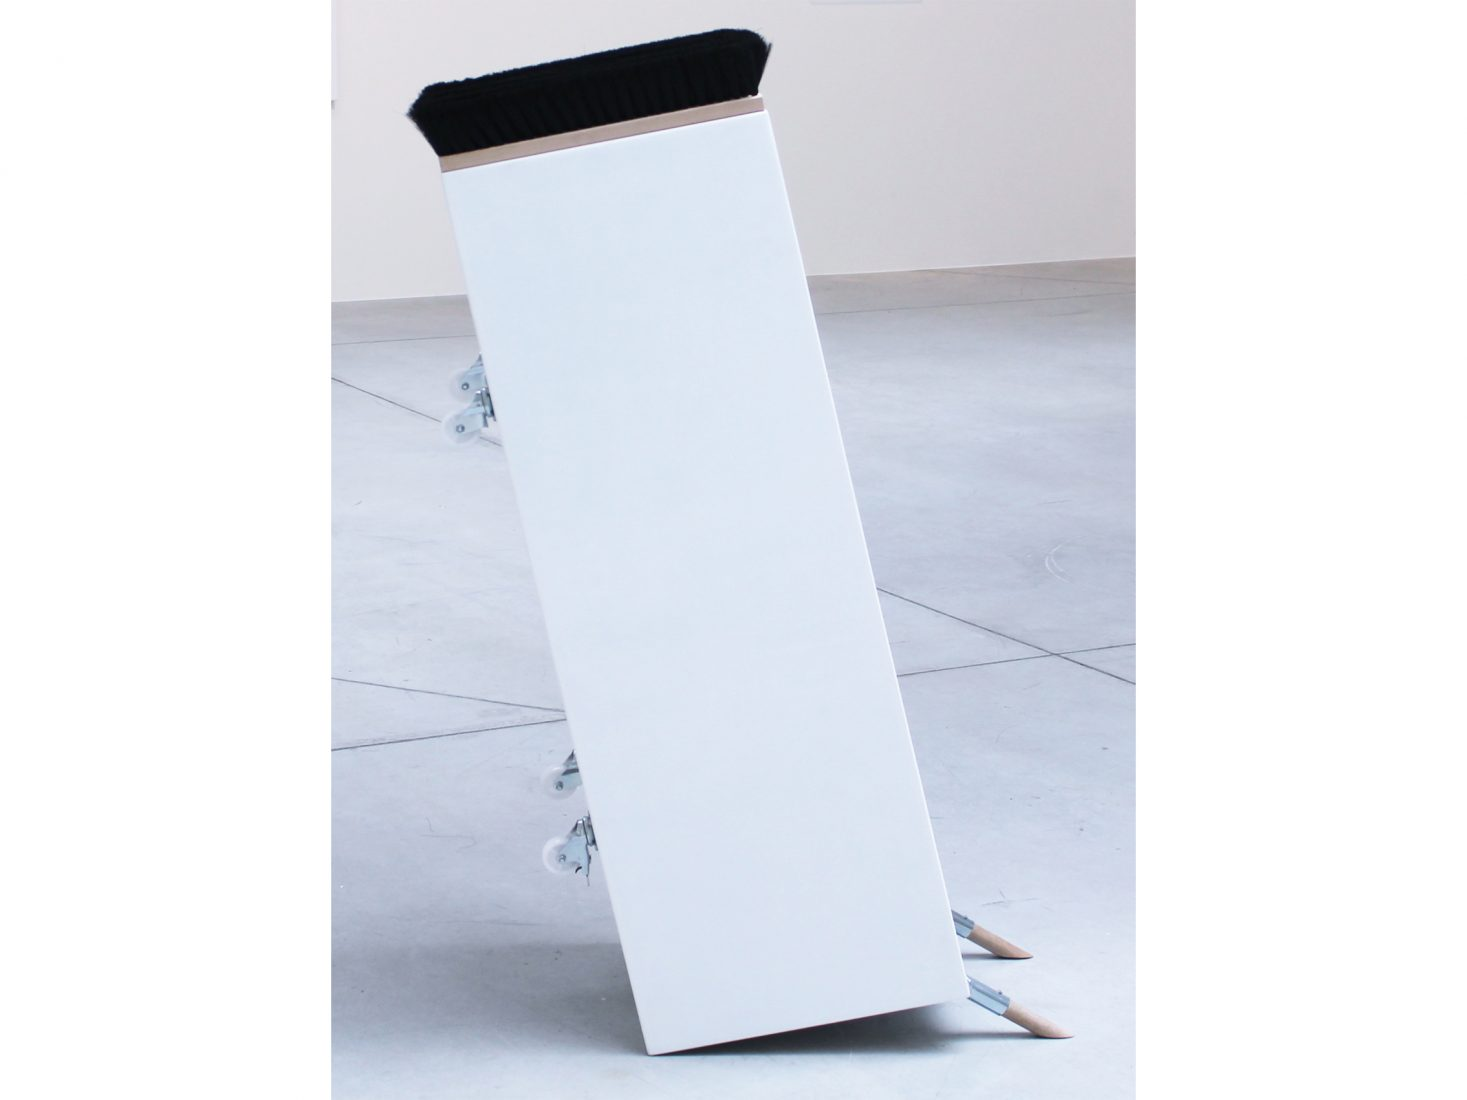 Michail Michailov. Pedestal #2, 2020, object, 137x40x60 cm